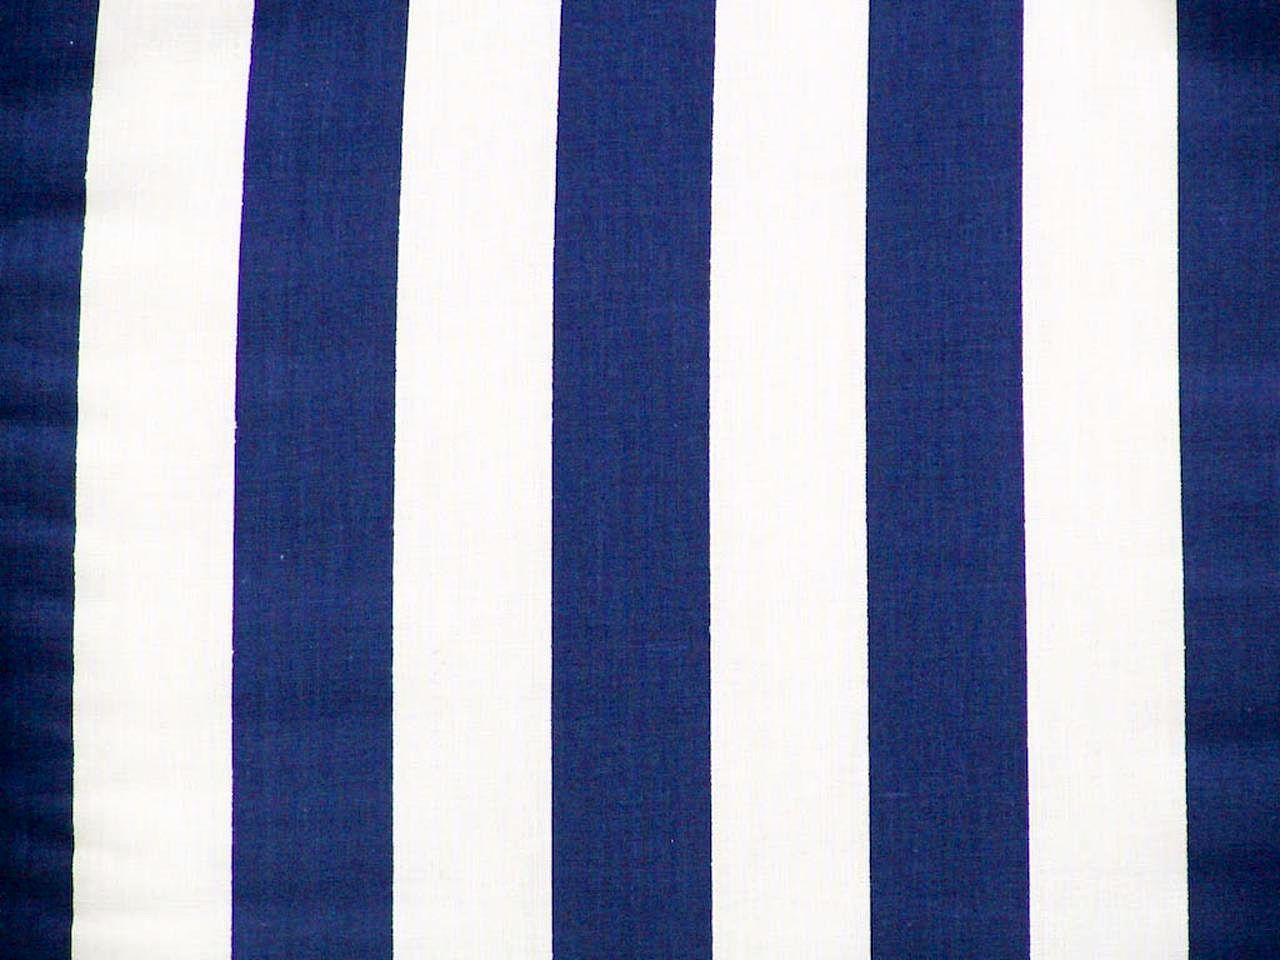 background blue white strips